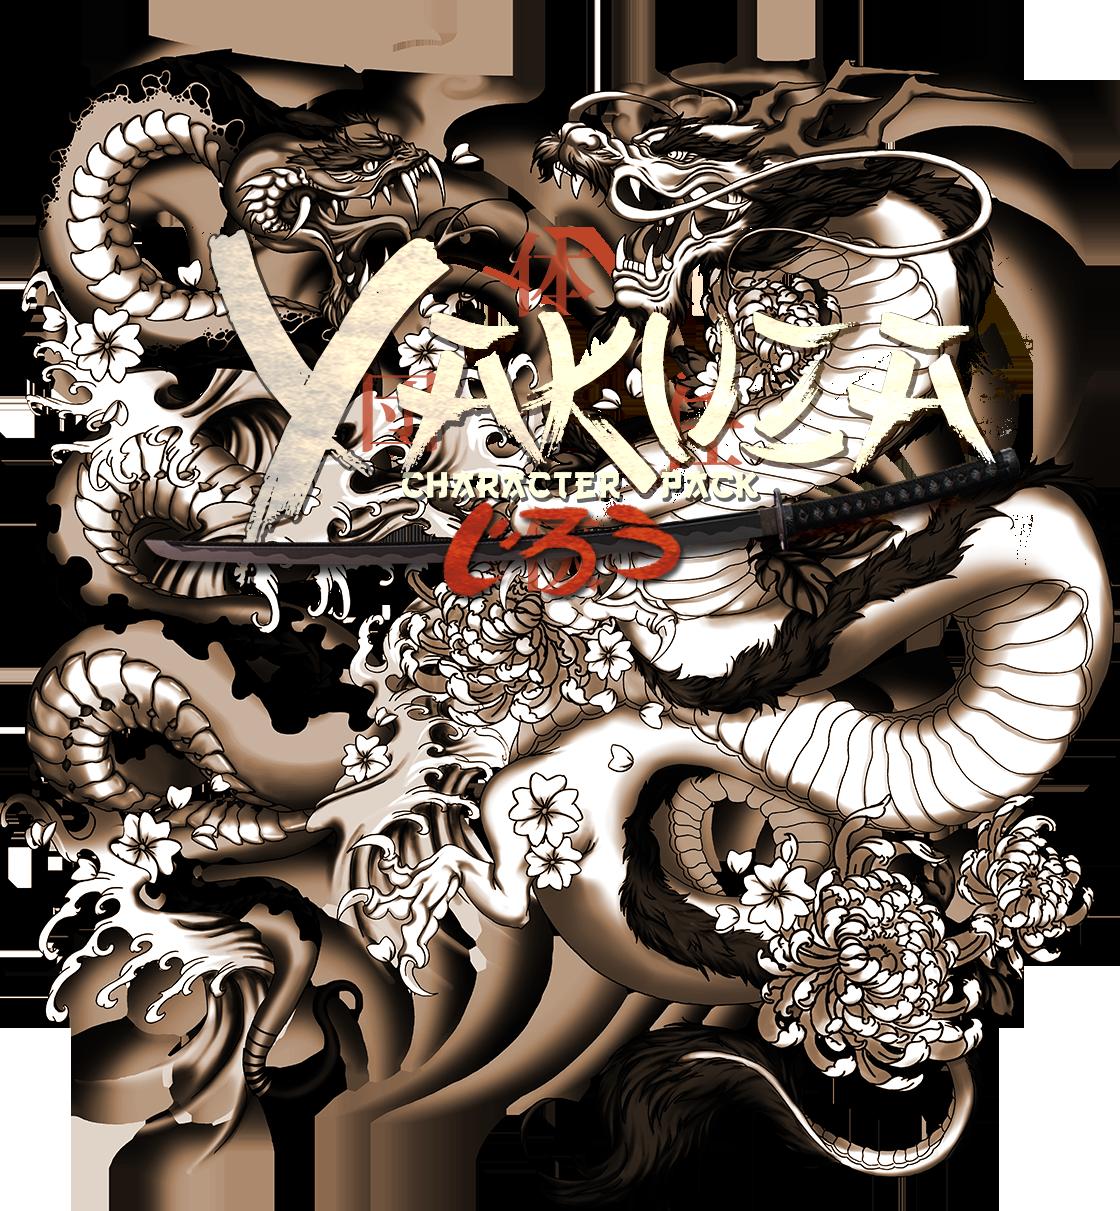 Download Yakuza Character Pack Payday 2 Jiro Tattoos Png Image With No Background Pngkey Com File:mizuki sawamura and yumi sawamura's dutchman's pipe tattoo.jpg. payday 2 jiro tattoos png image with no